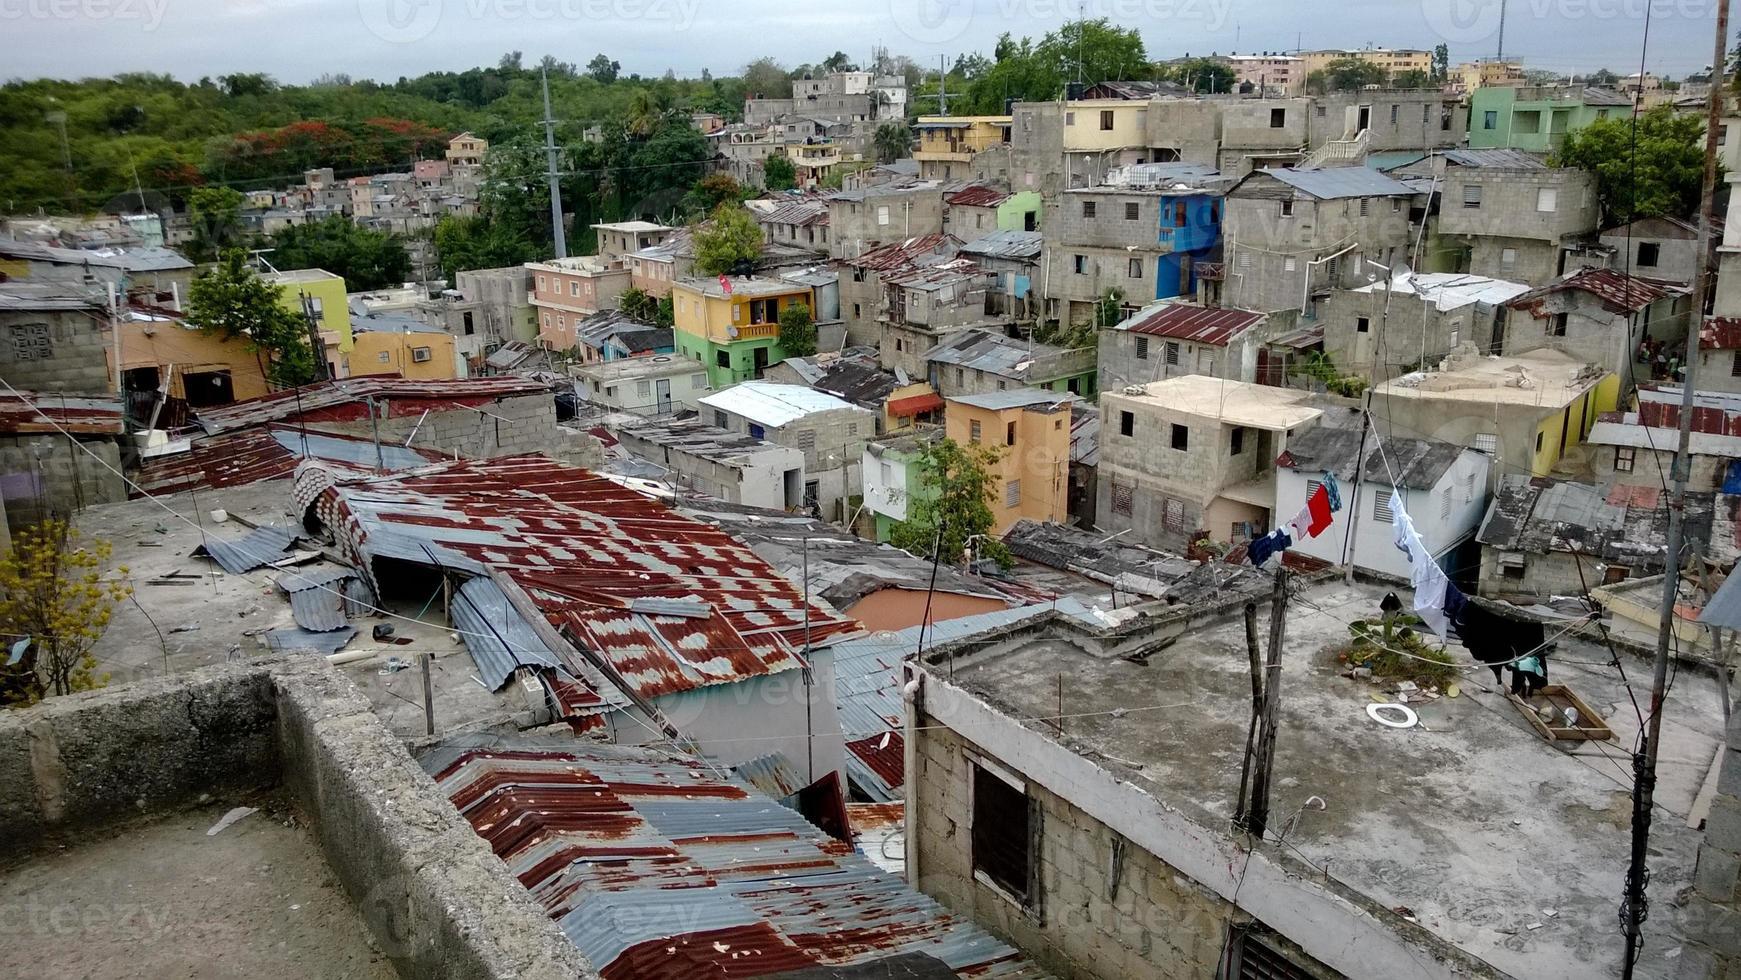 bairro de favelas na república dominicana foto